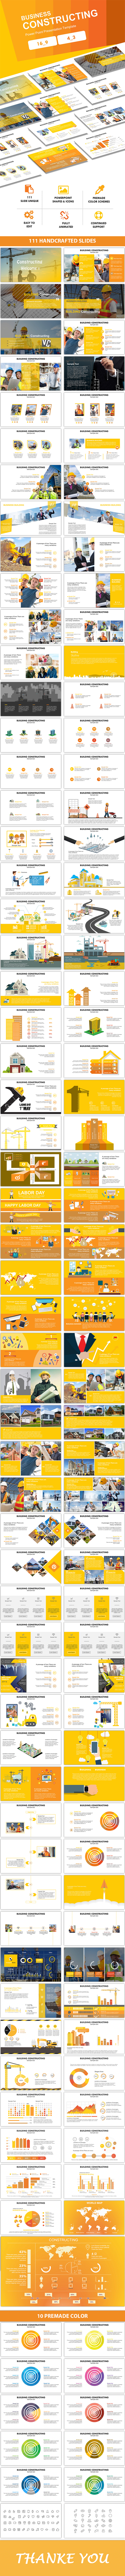 Constructing Business Powerpoint Presentation Template  #Pitch Deck Slides #advertisement • Download ➝ https://graphicriver.net/item/constructing-business-powerpoint-presentation-template/18521559?ref=pxcr